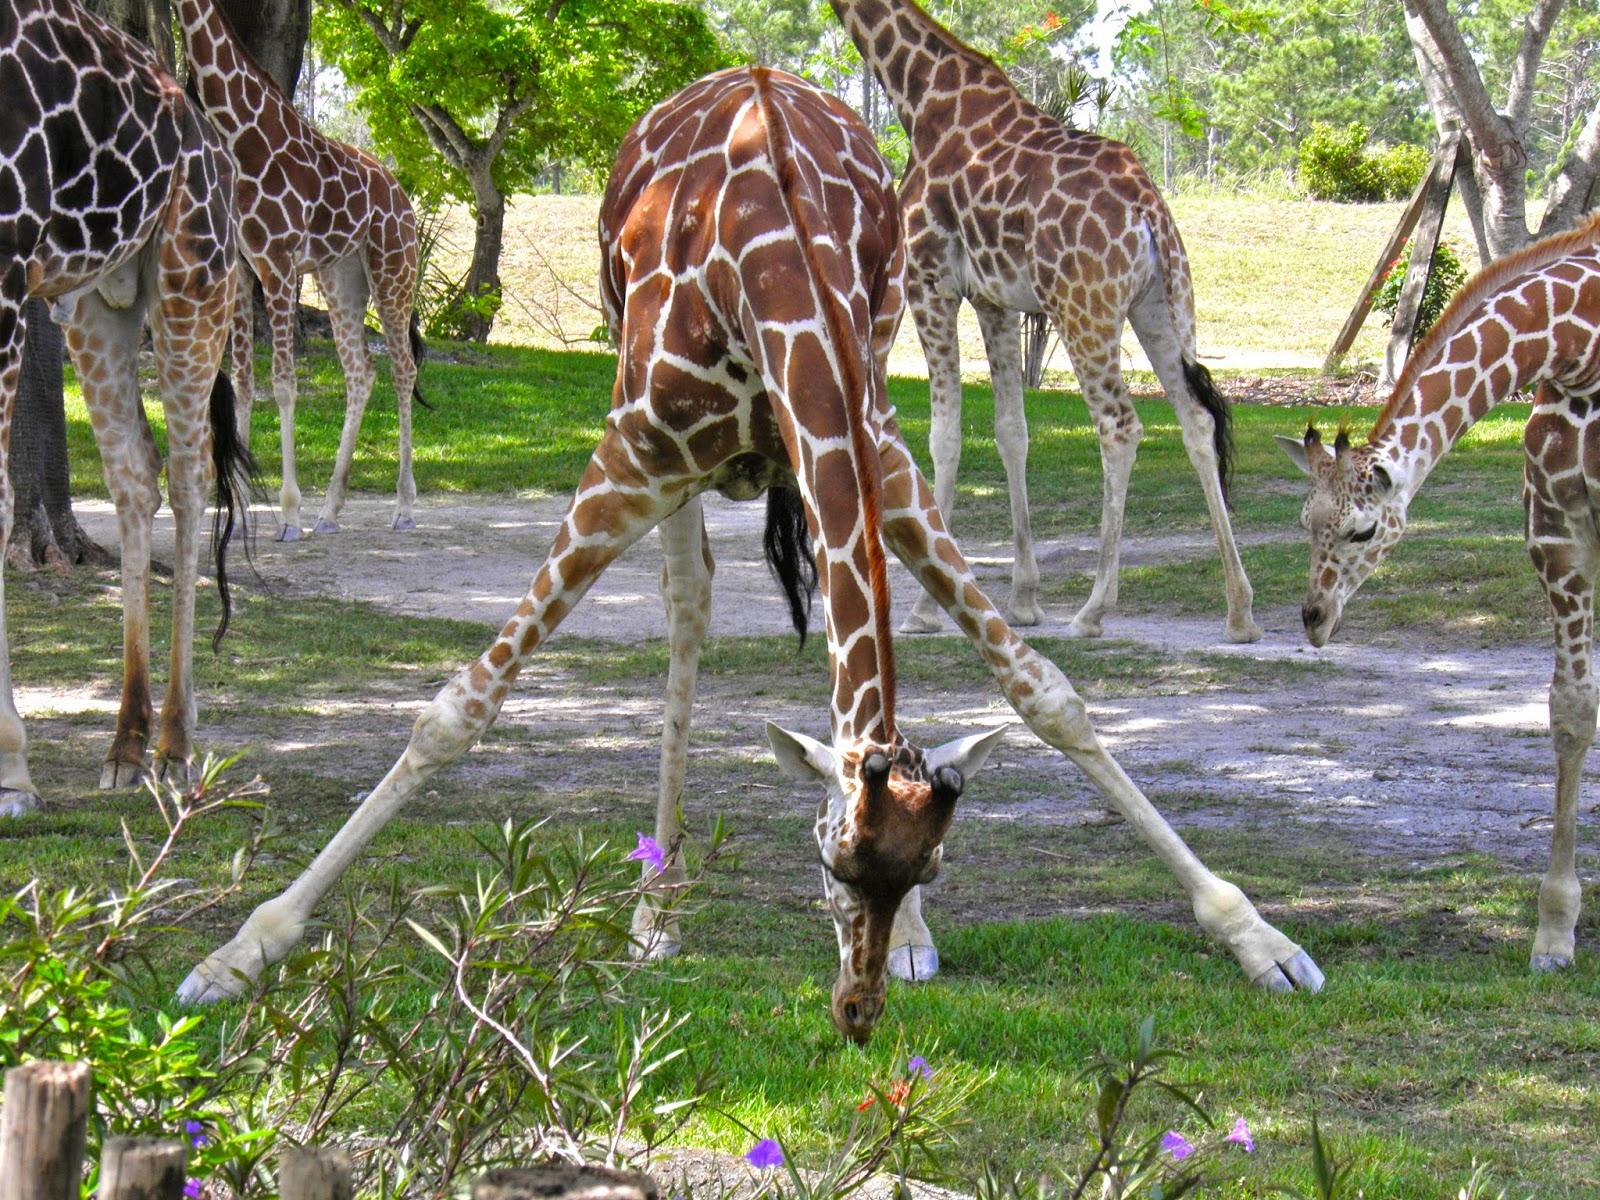 Zoo de Miami | From Spain to Miami